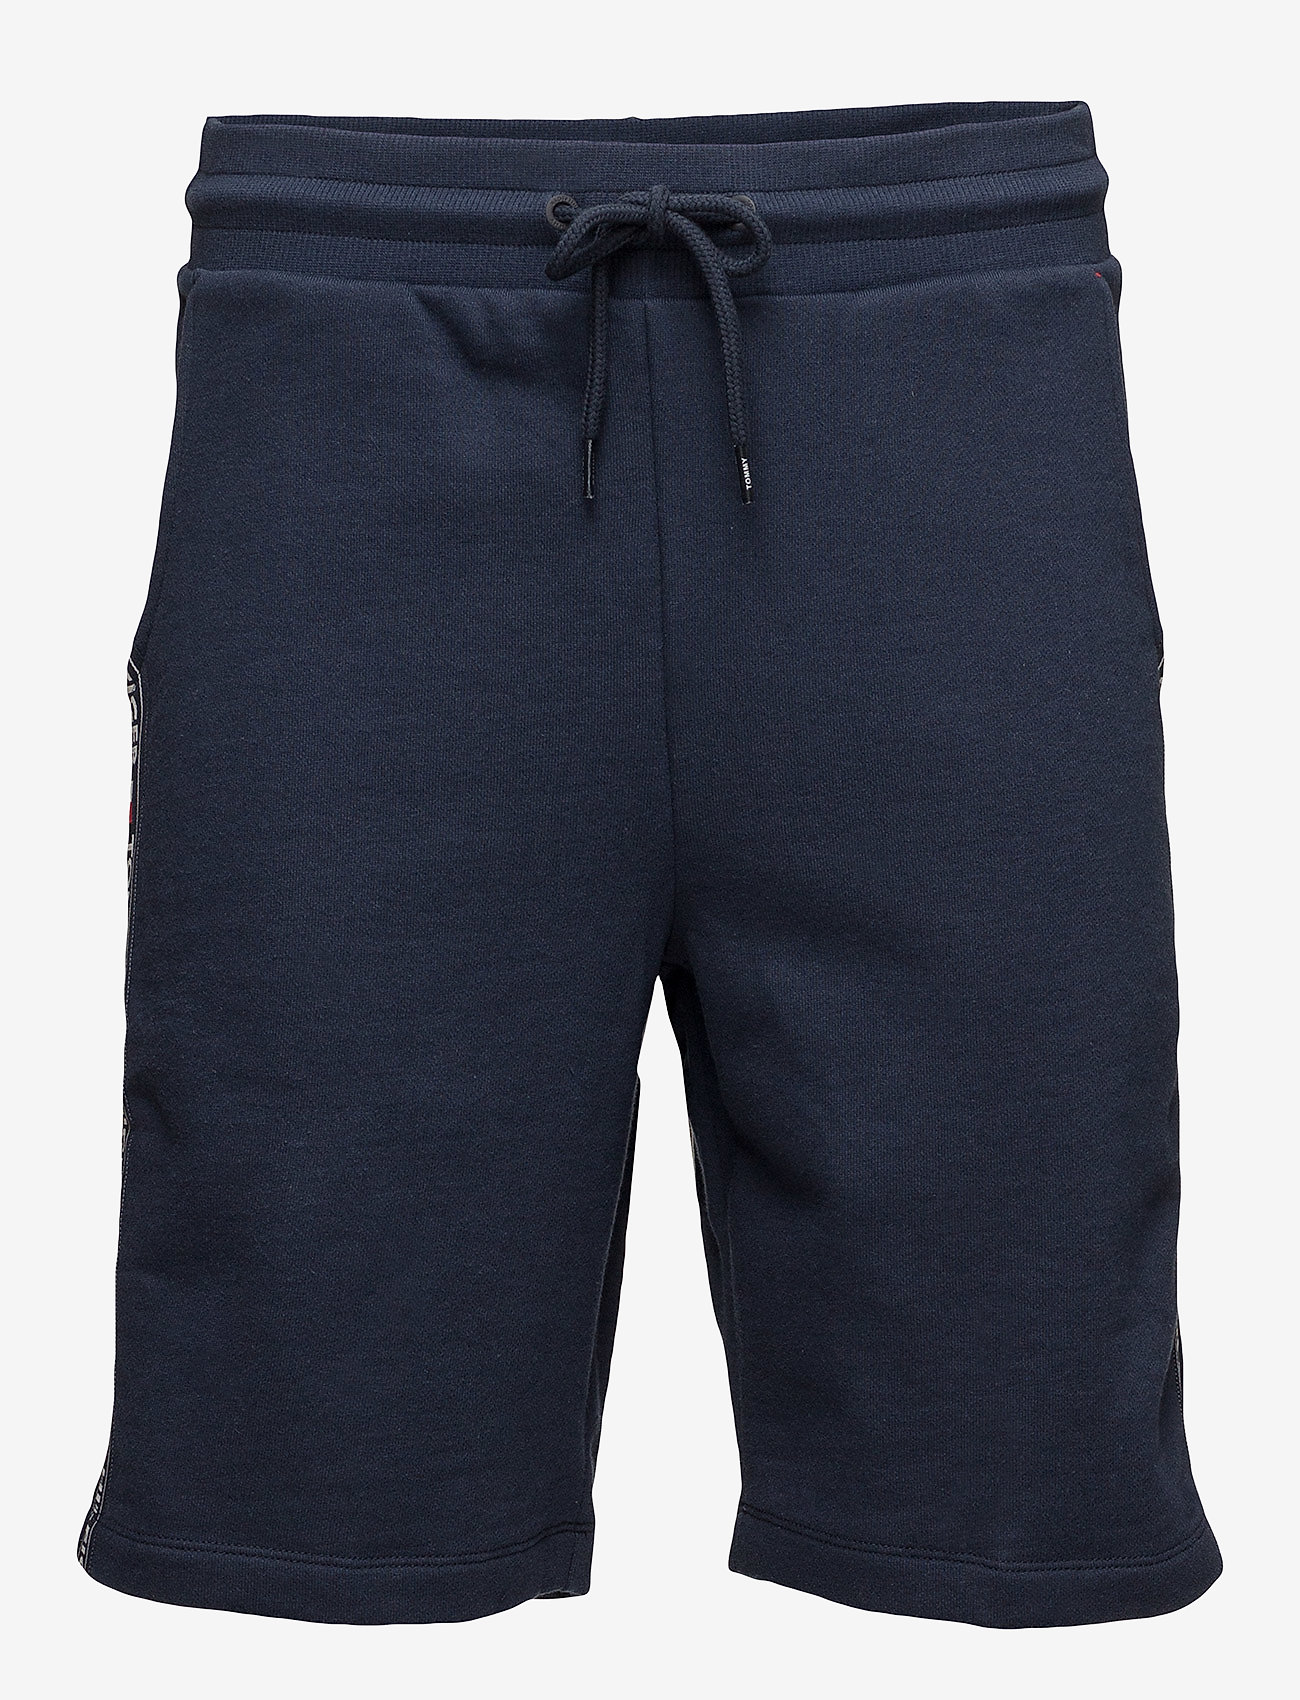 Tommy Hilfiger - SHORT HWK - bottoms - navy blazer - 0